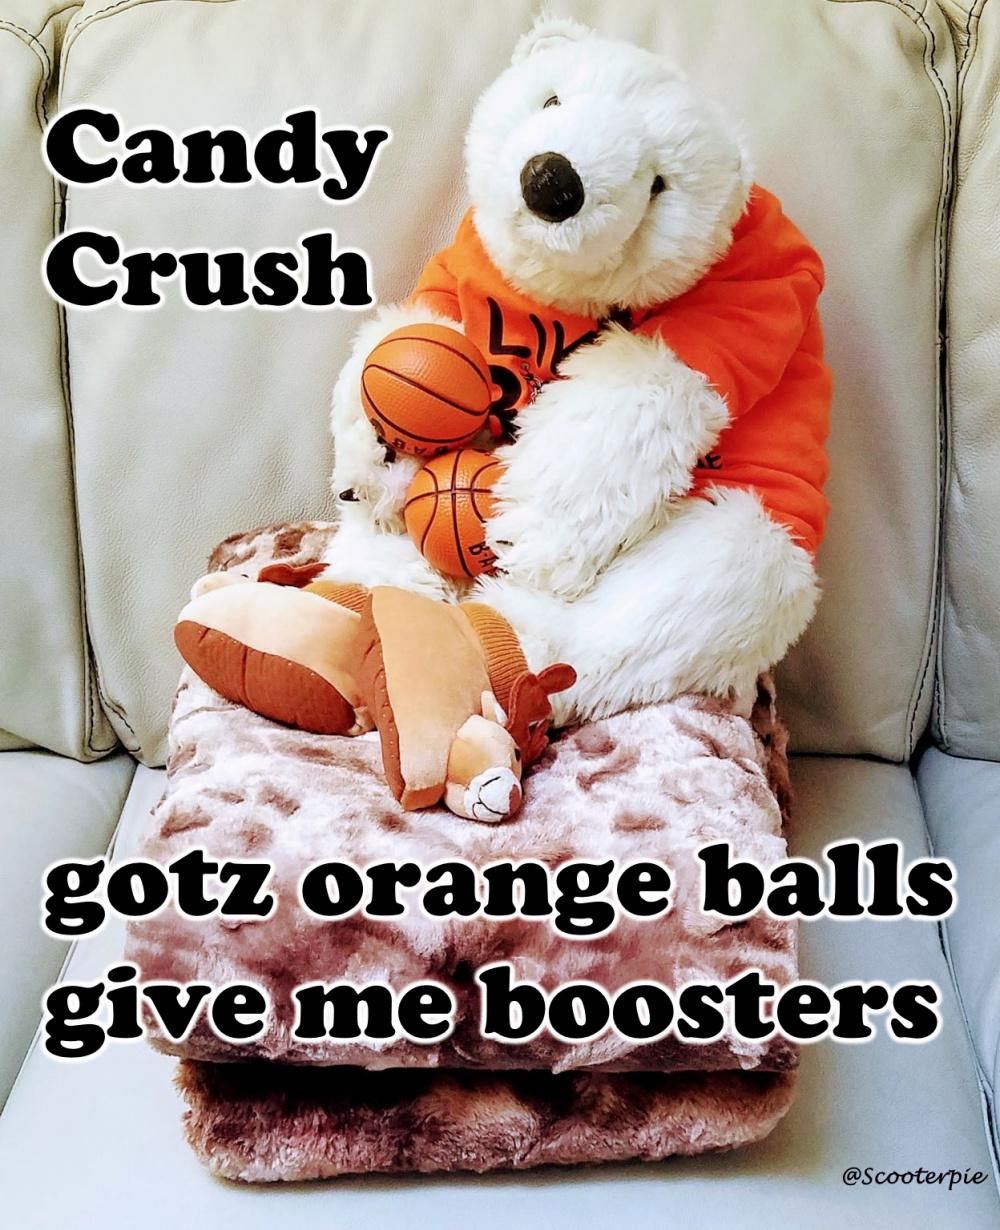 CandyCrushSaga_FanArt_Scooterpie.jpg